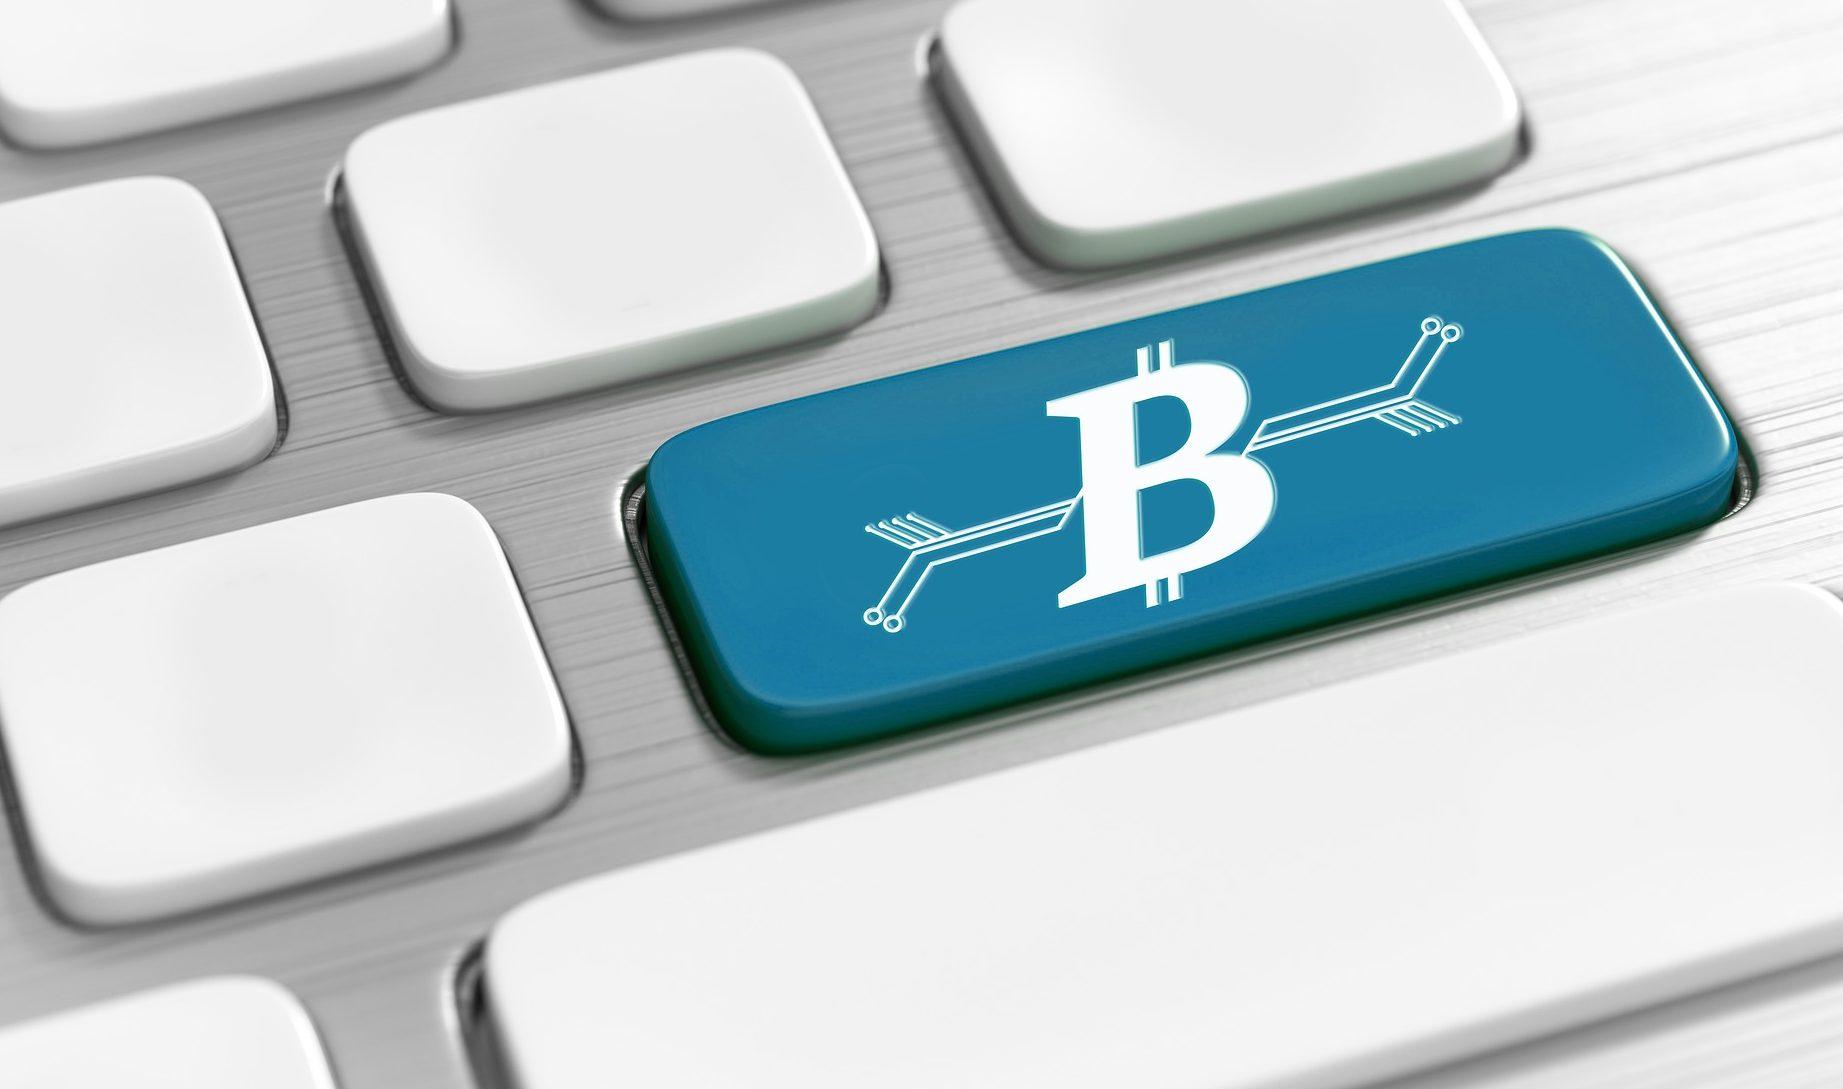 Healthcare Organizatio Adopt Blockchain Technology by 2020